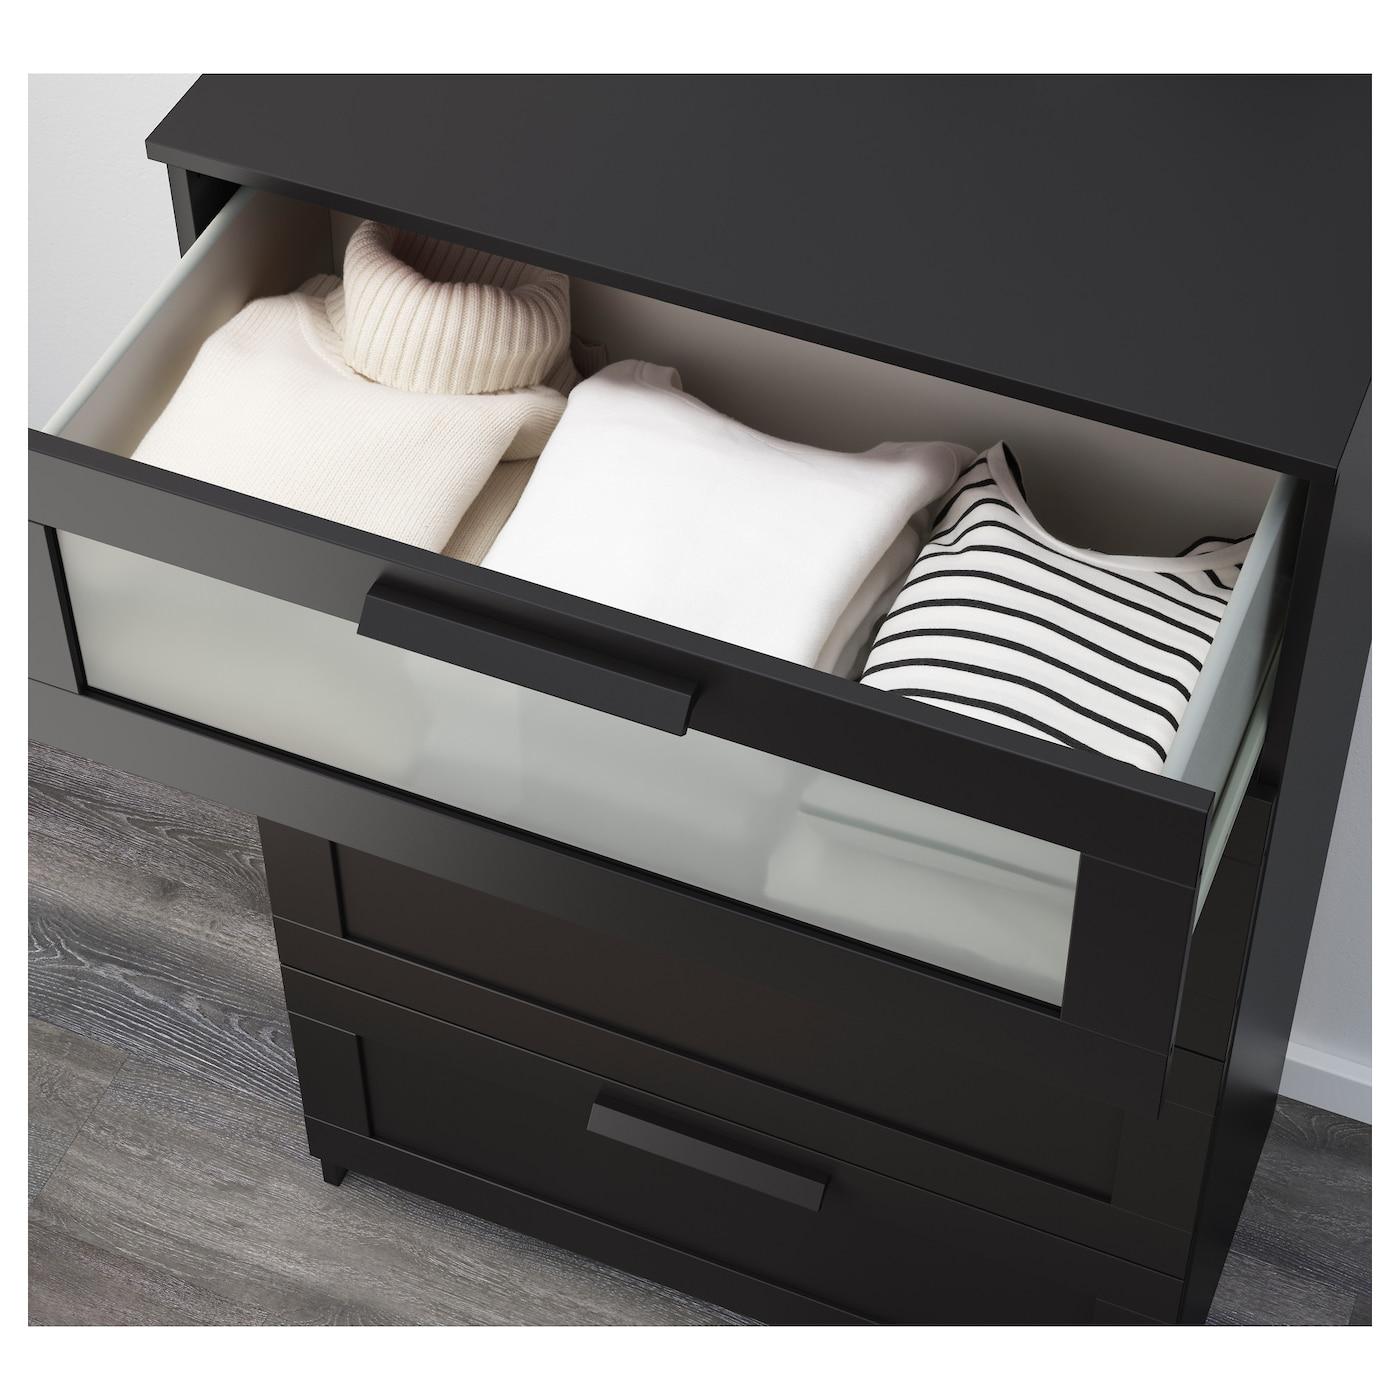 brimnes commode 4 tiroirs noir verre givr 78 x 124 cm ikea. Black Bedroom Furniture Sets. Home Design Ideas